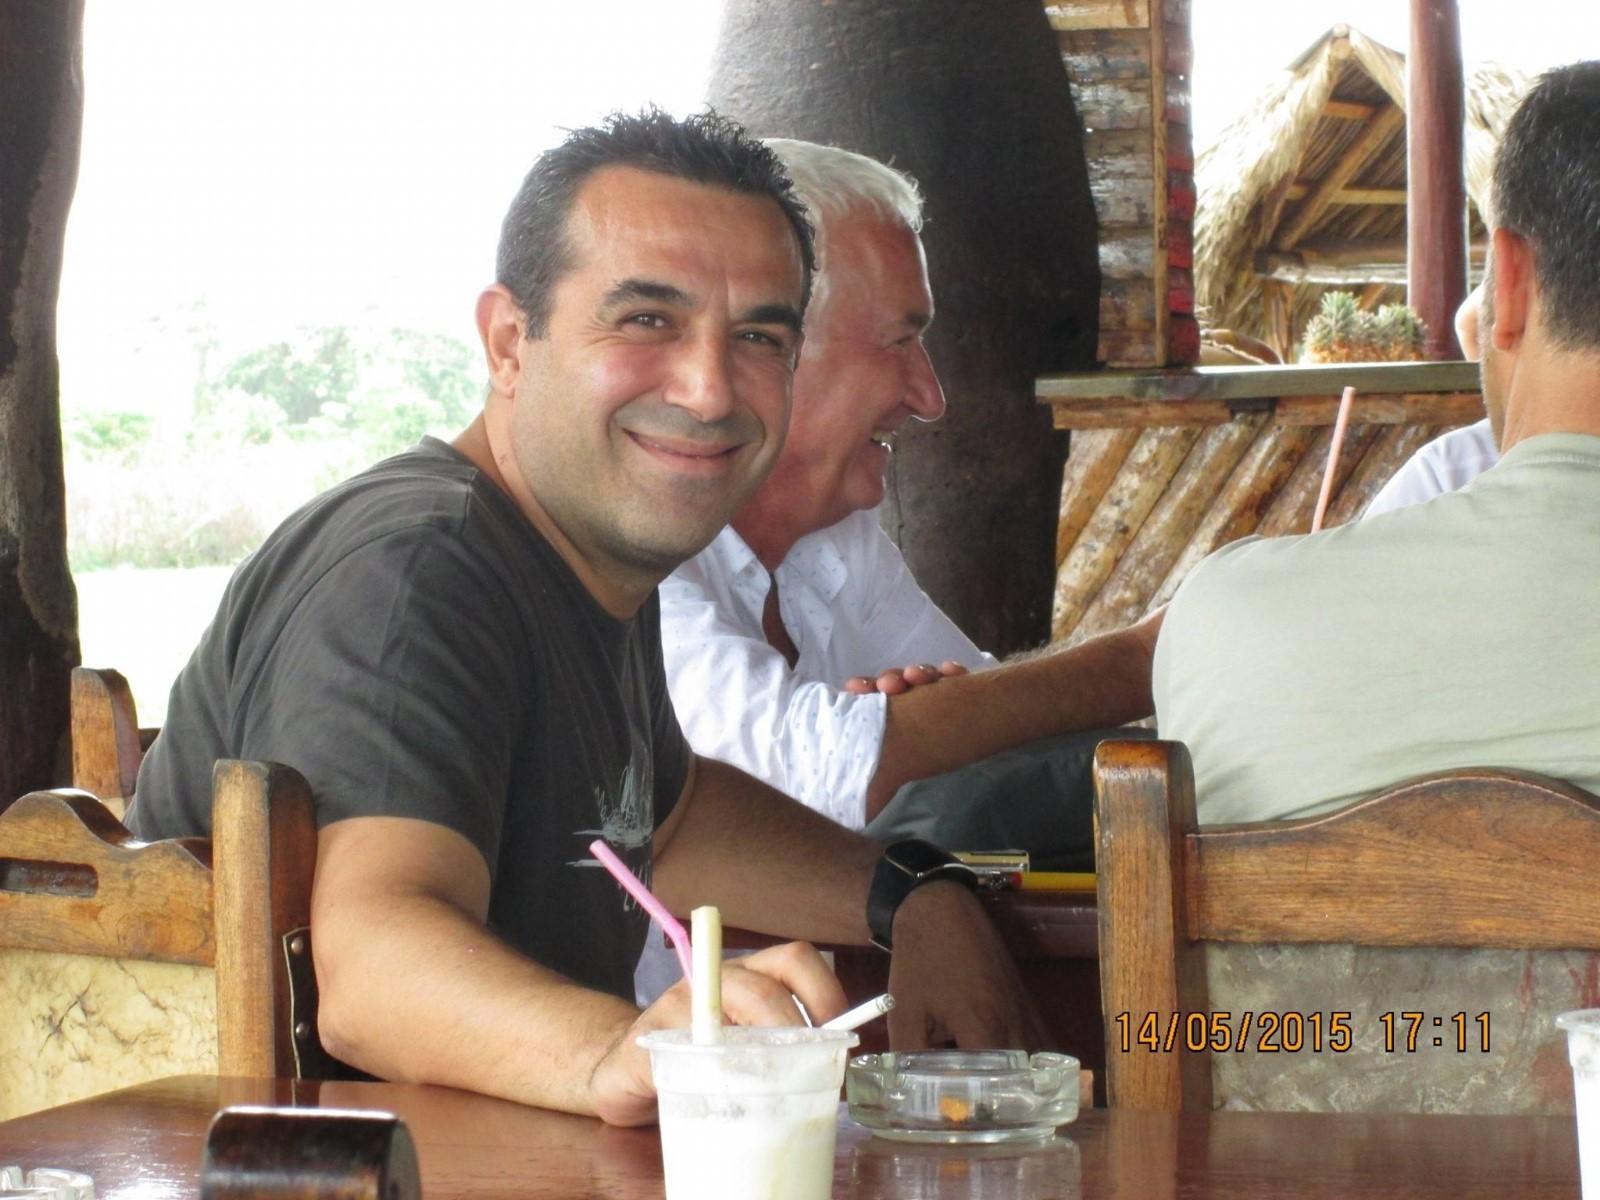 MEKSİKA KÜBA TURLARI - 12 GÜN AIRFRANCE